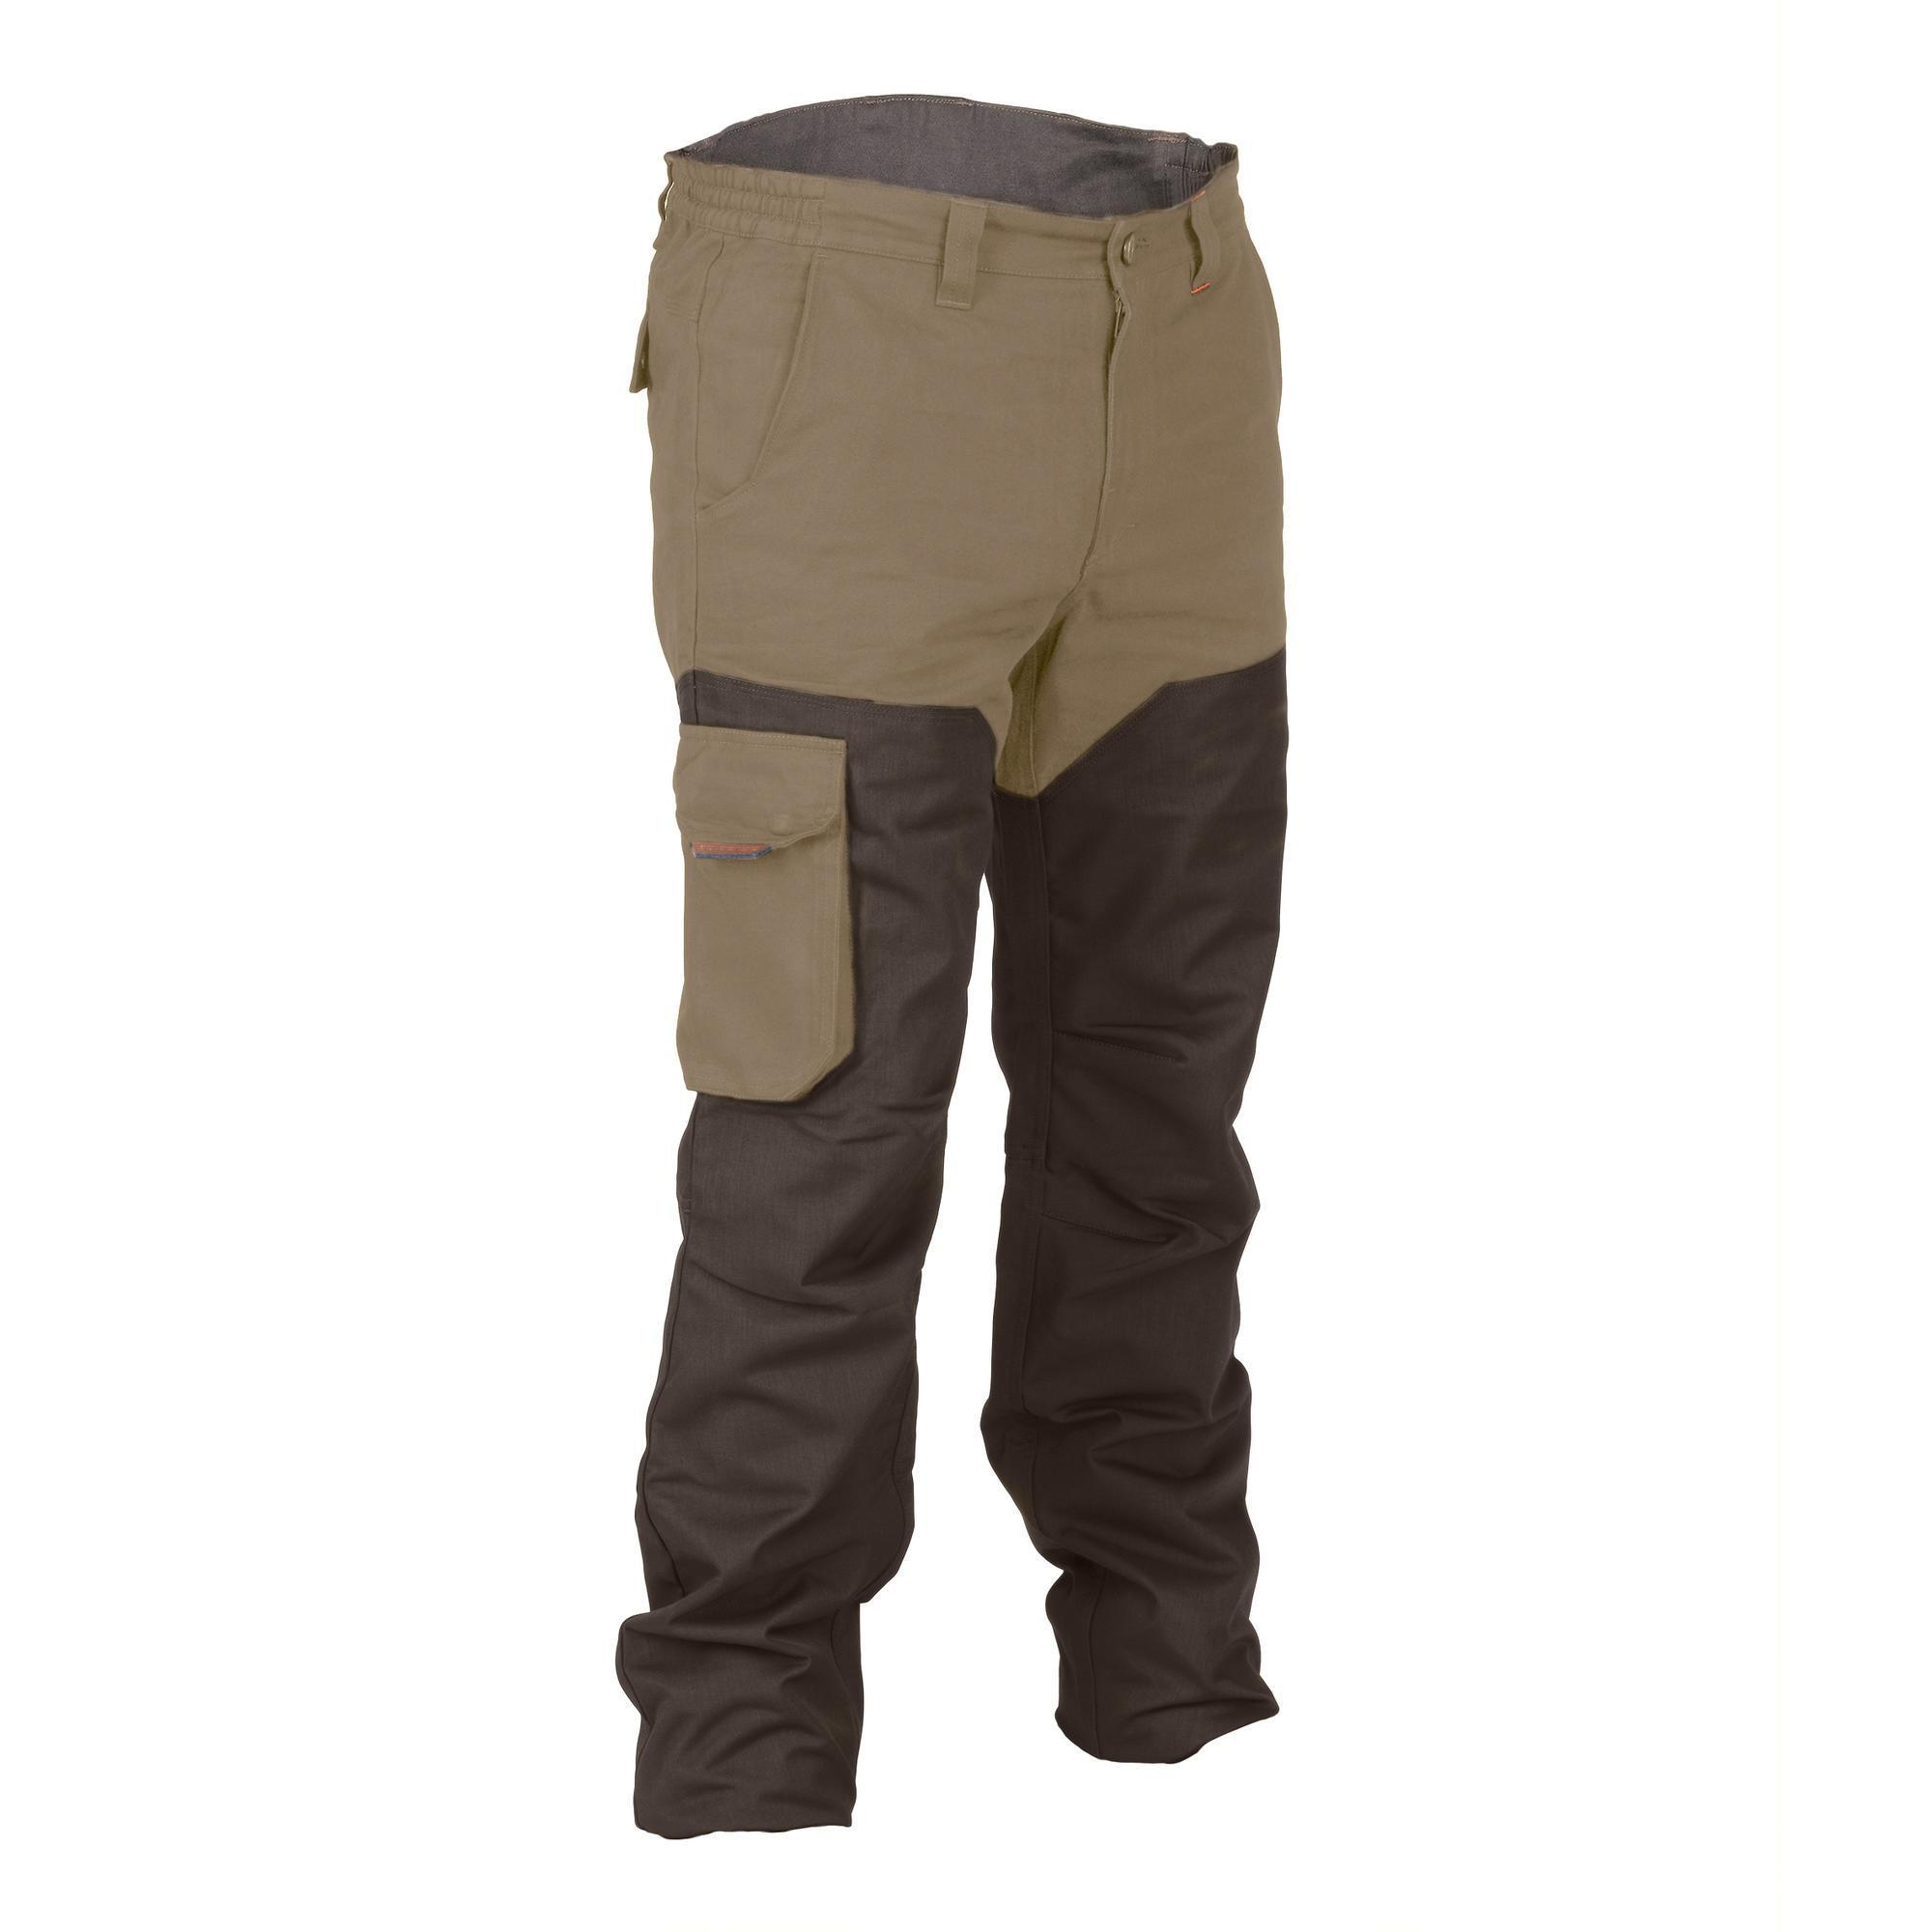 JAGDHOSE RENFORT 520 ZWEIFARBIG BRAUN   Sportbekleidung > Sporthosen > Trekkinghosen   Solognac